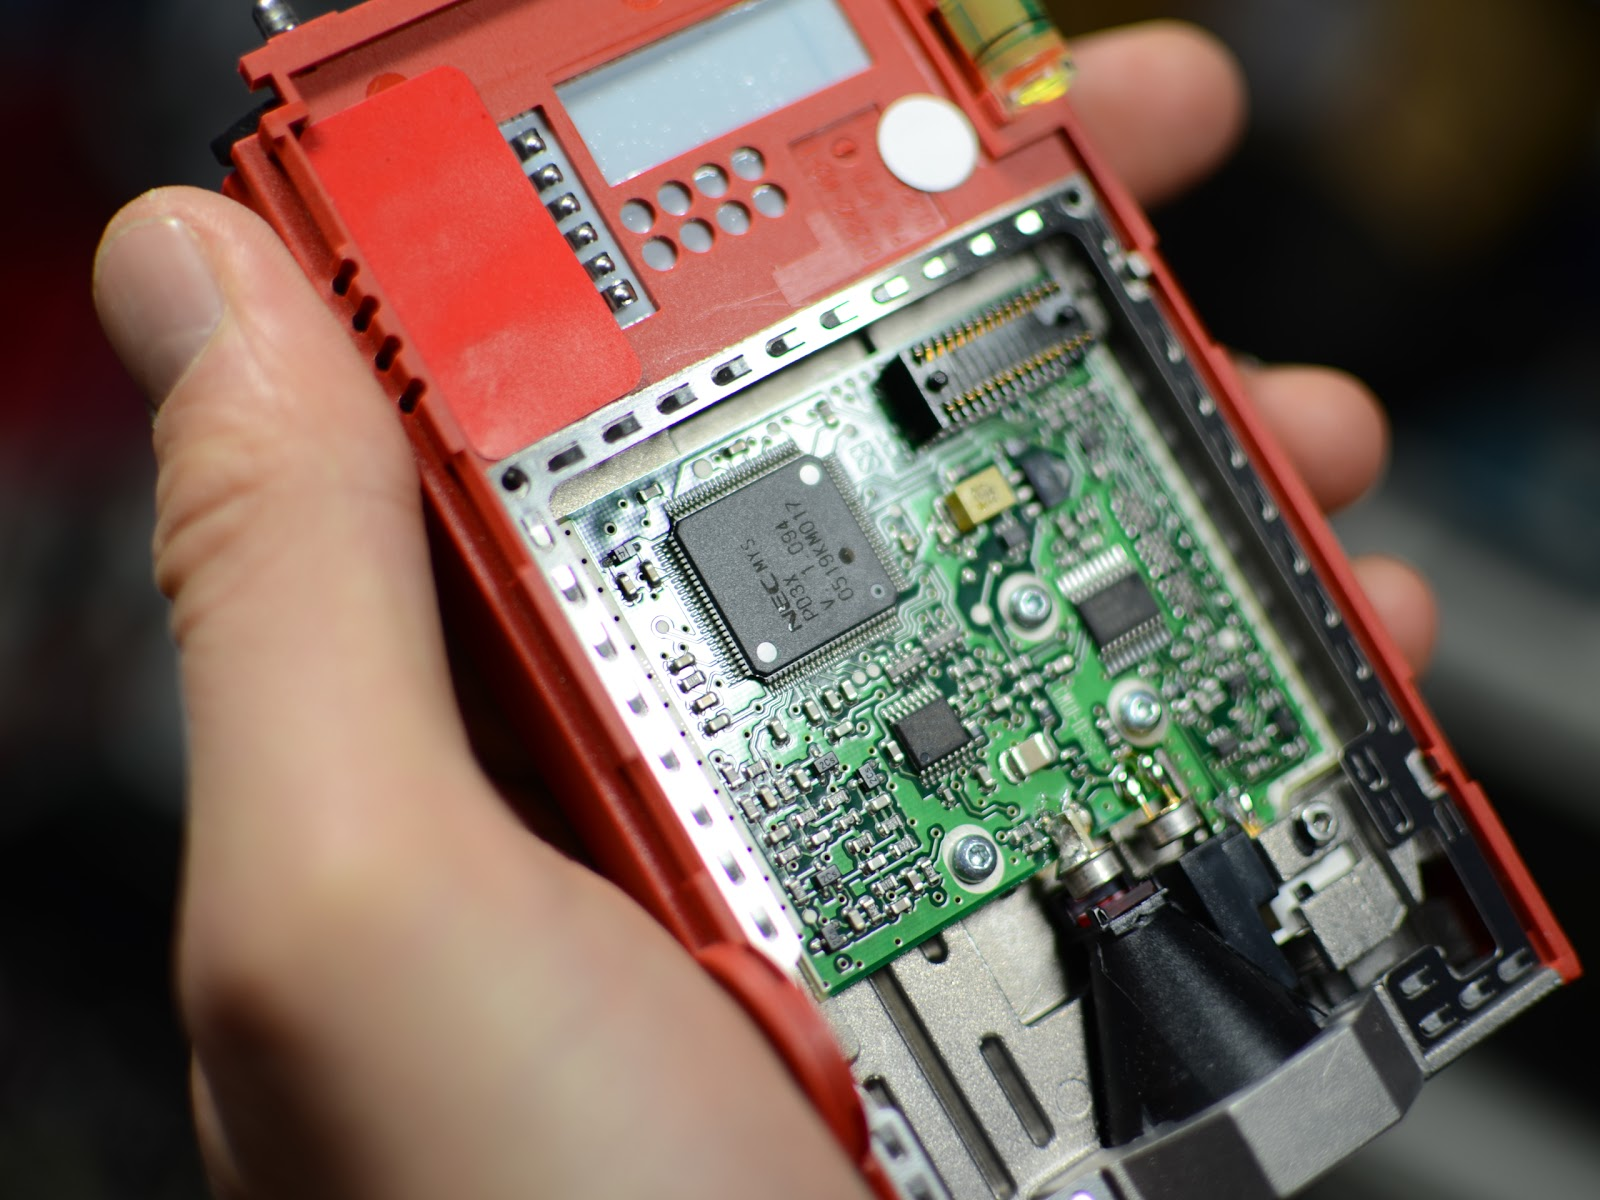 debugmo de what s inside hilti pd 30 rh debugmo de Samsung Owners Manuals Hilti PD 32 Manual